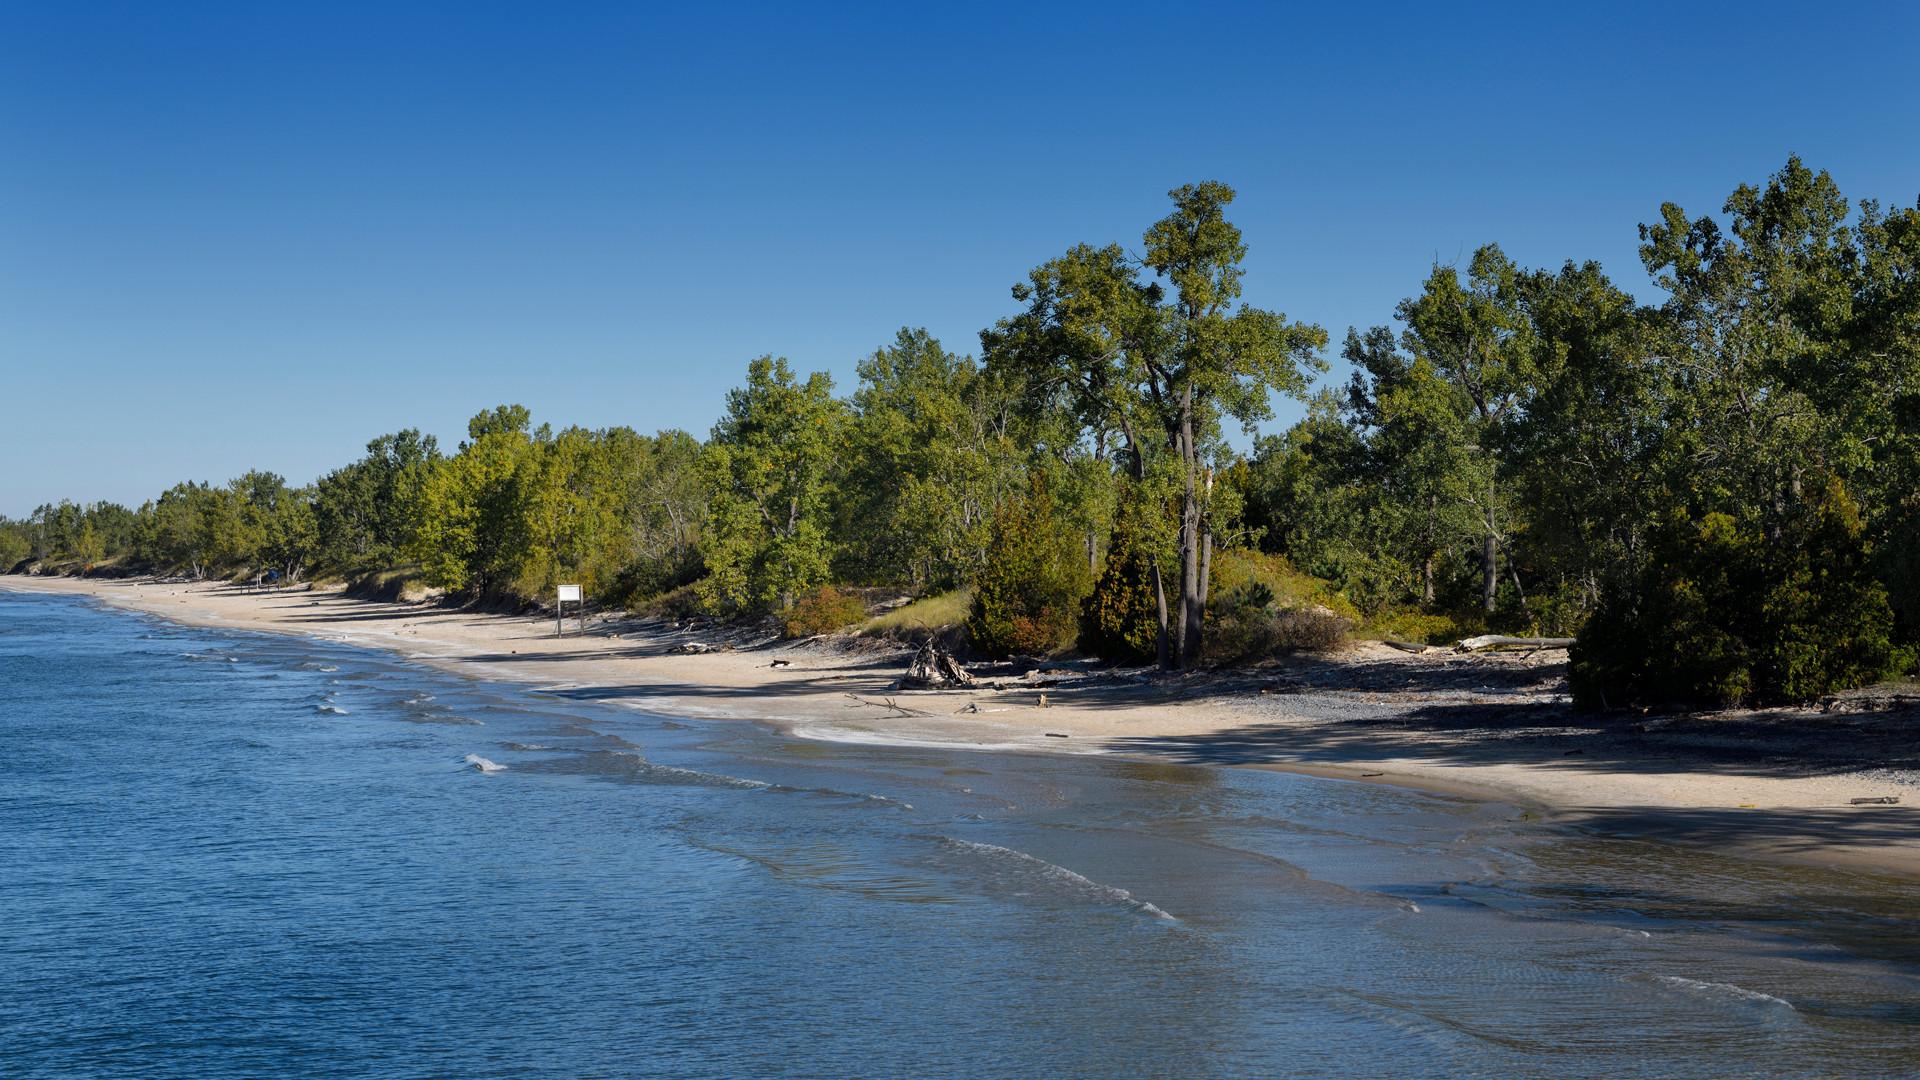 Breathtaking Ontario beaches | The beach slopes gently into Lake Ontario at Sandbanks